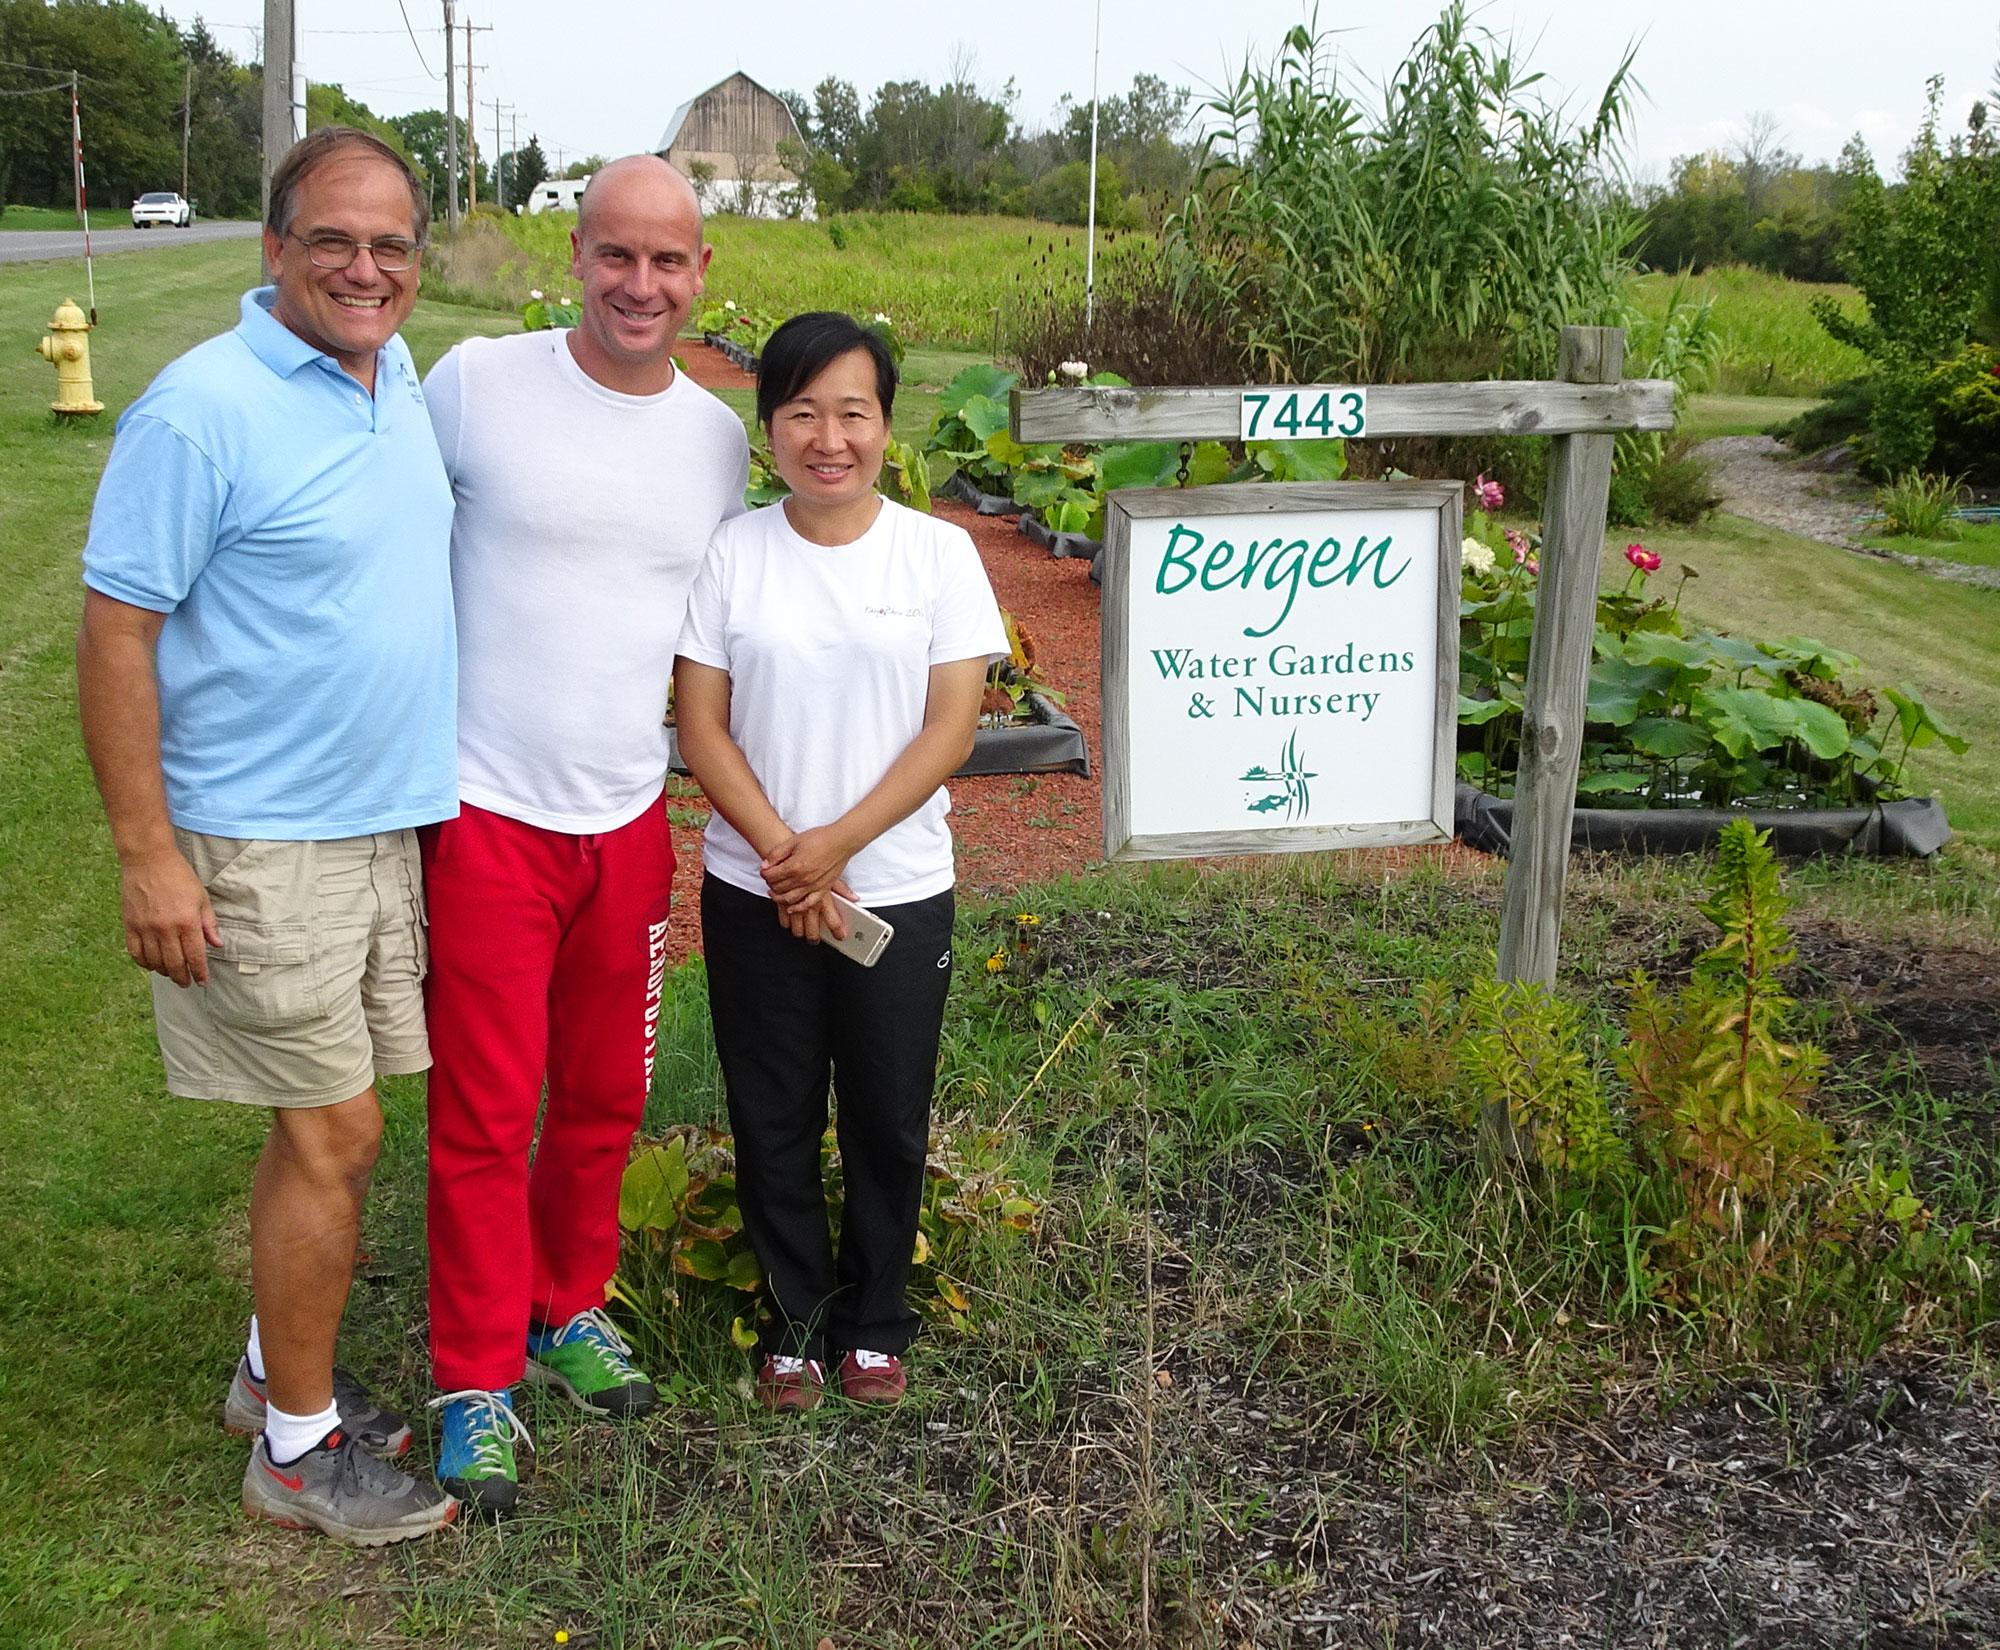 Gianluca, Larry Nau e Lily all'ingresso di Bergen Watergardens